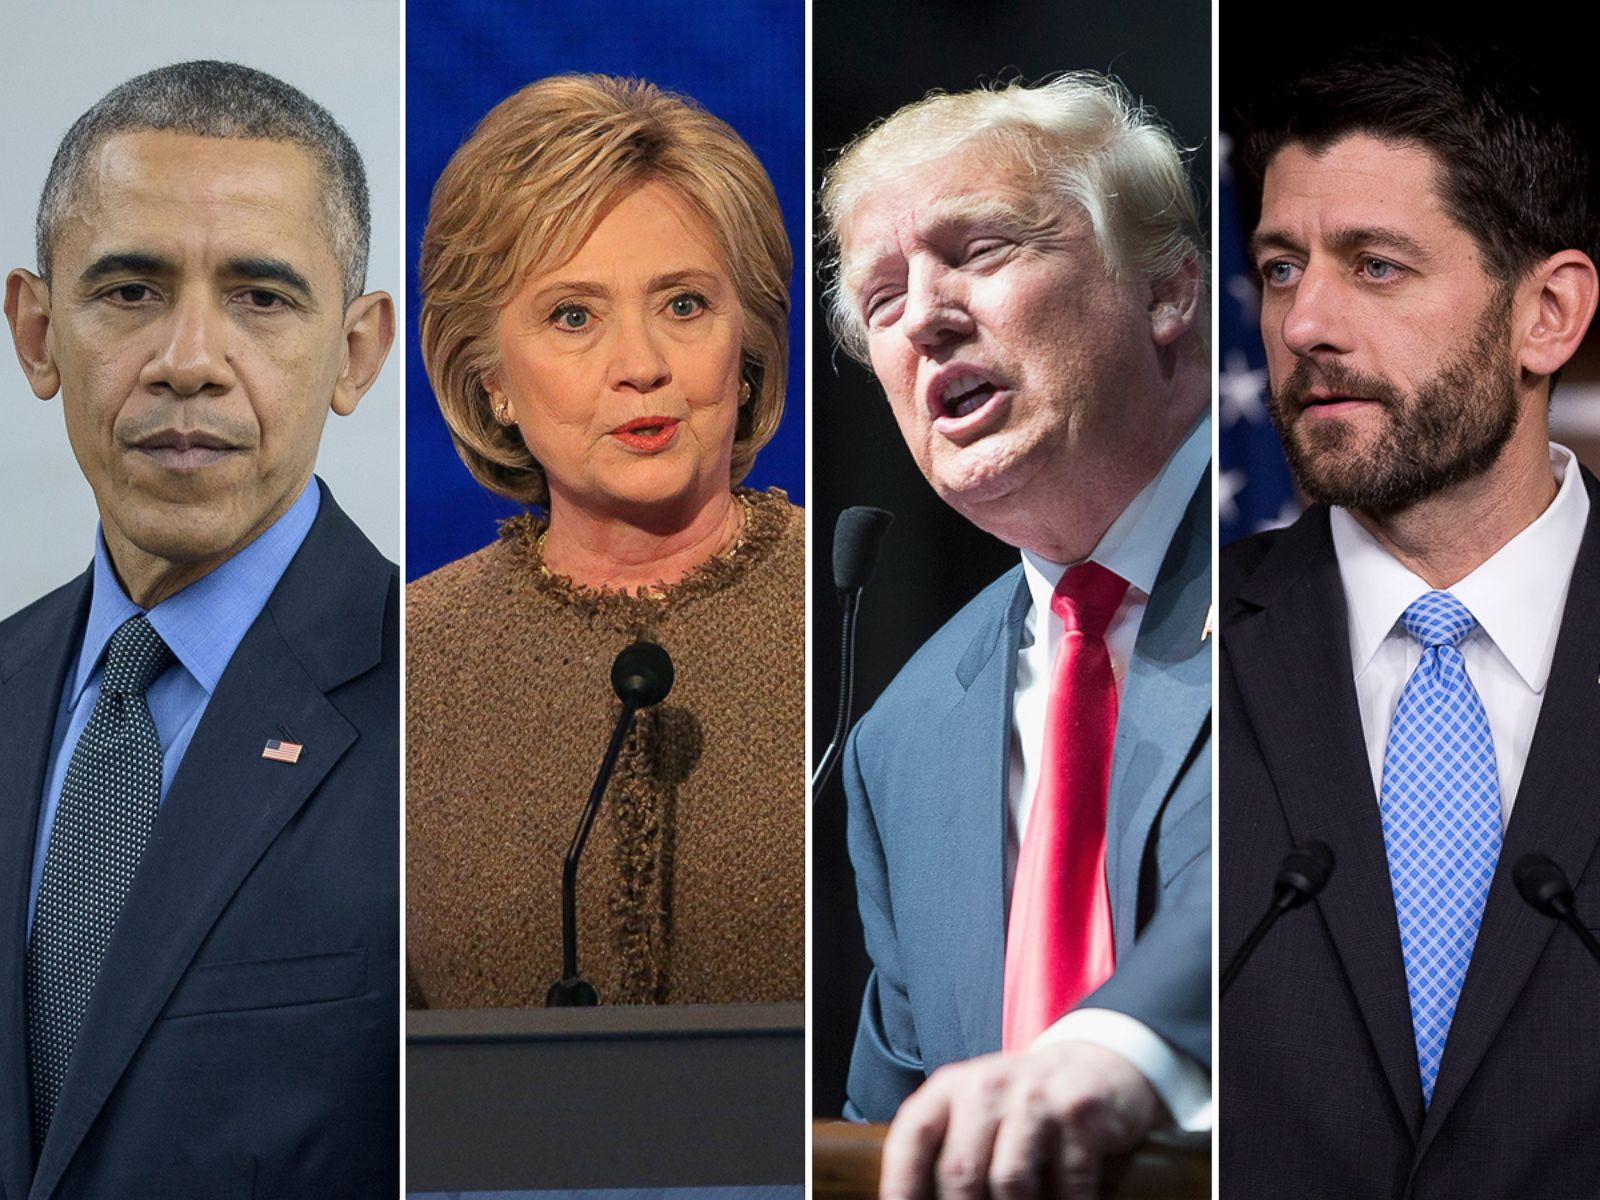 2015's Most Memorable Political Moments